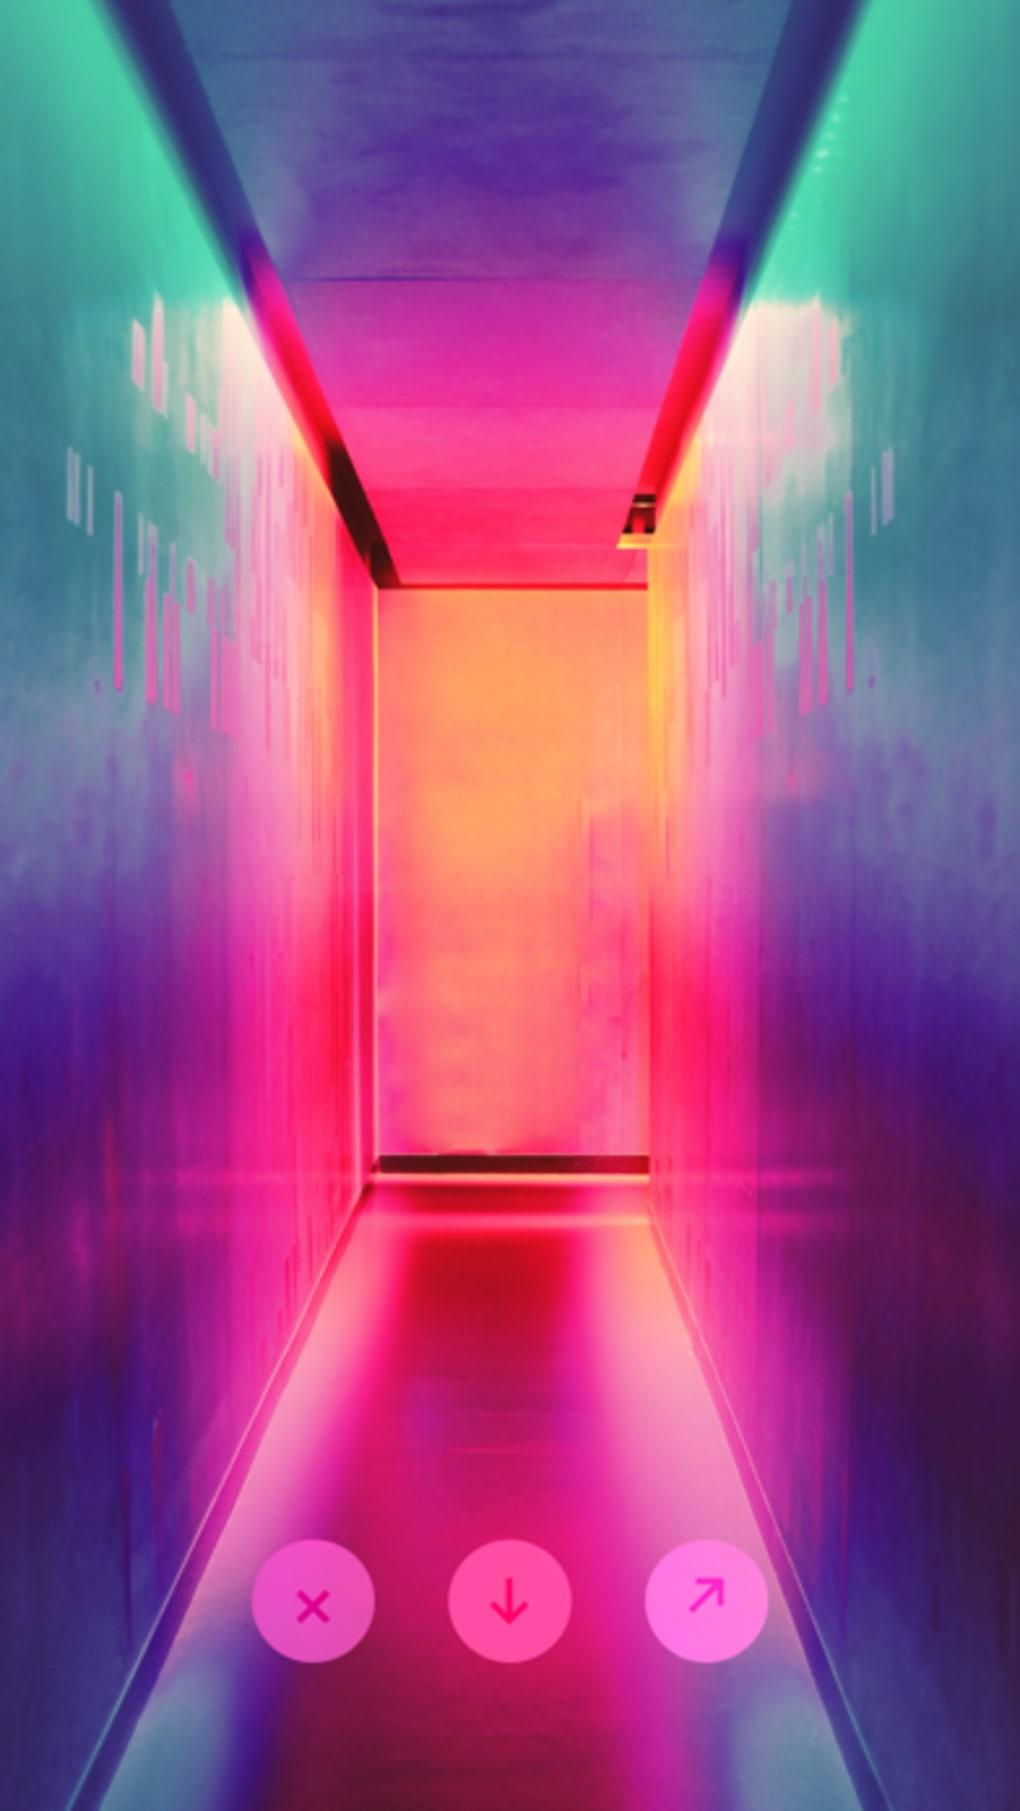 Frame Wallpaper For Unsplash Colorful Wallpaper Iphone 11 1020x1811 Wallpaper Teahub Io